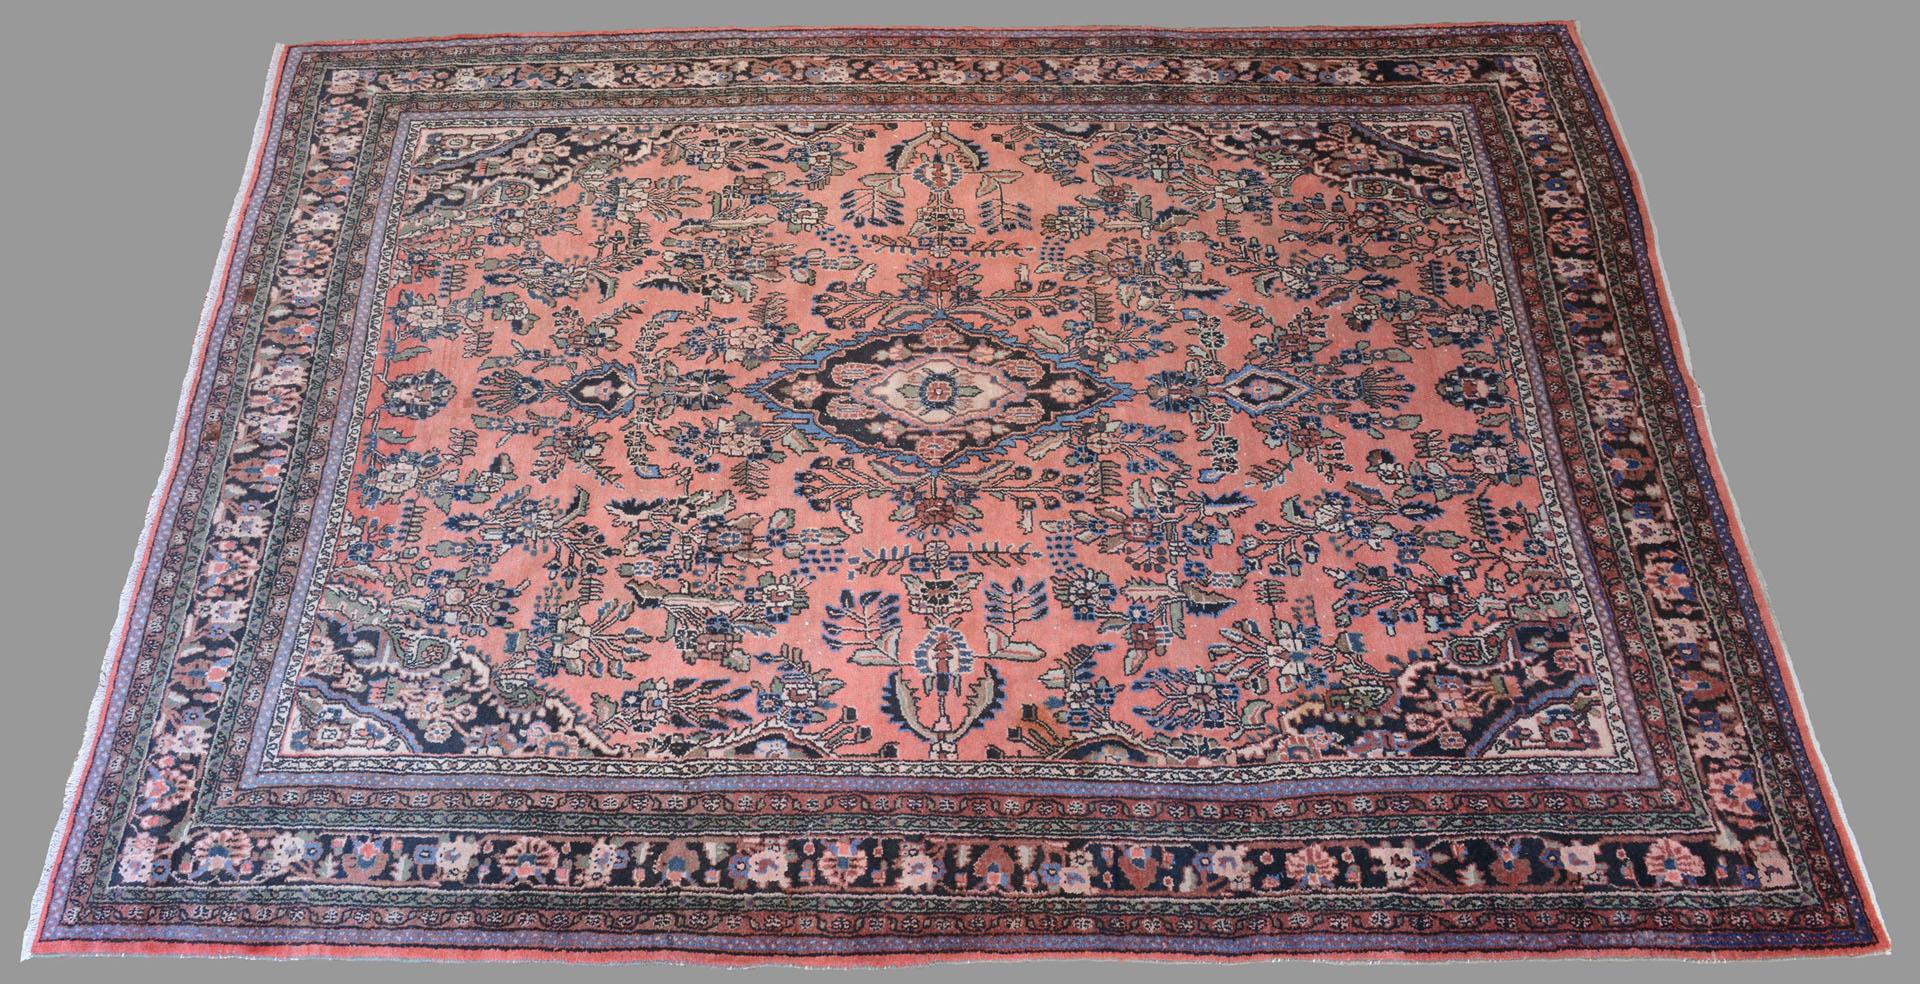 Semi-Antique Persian Arak Carpet